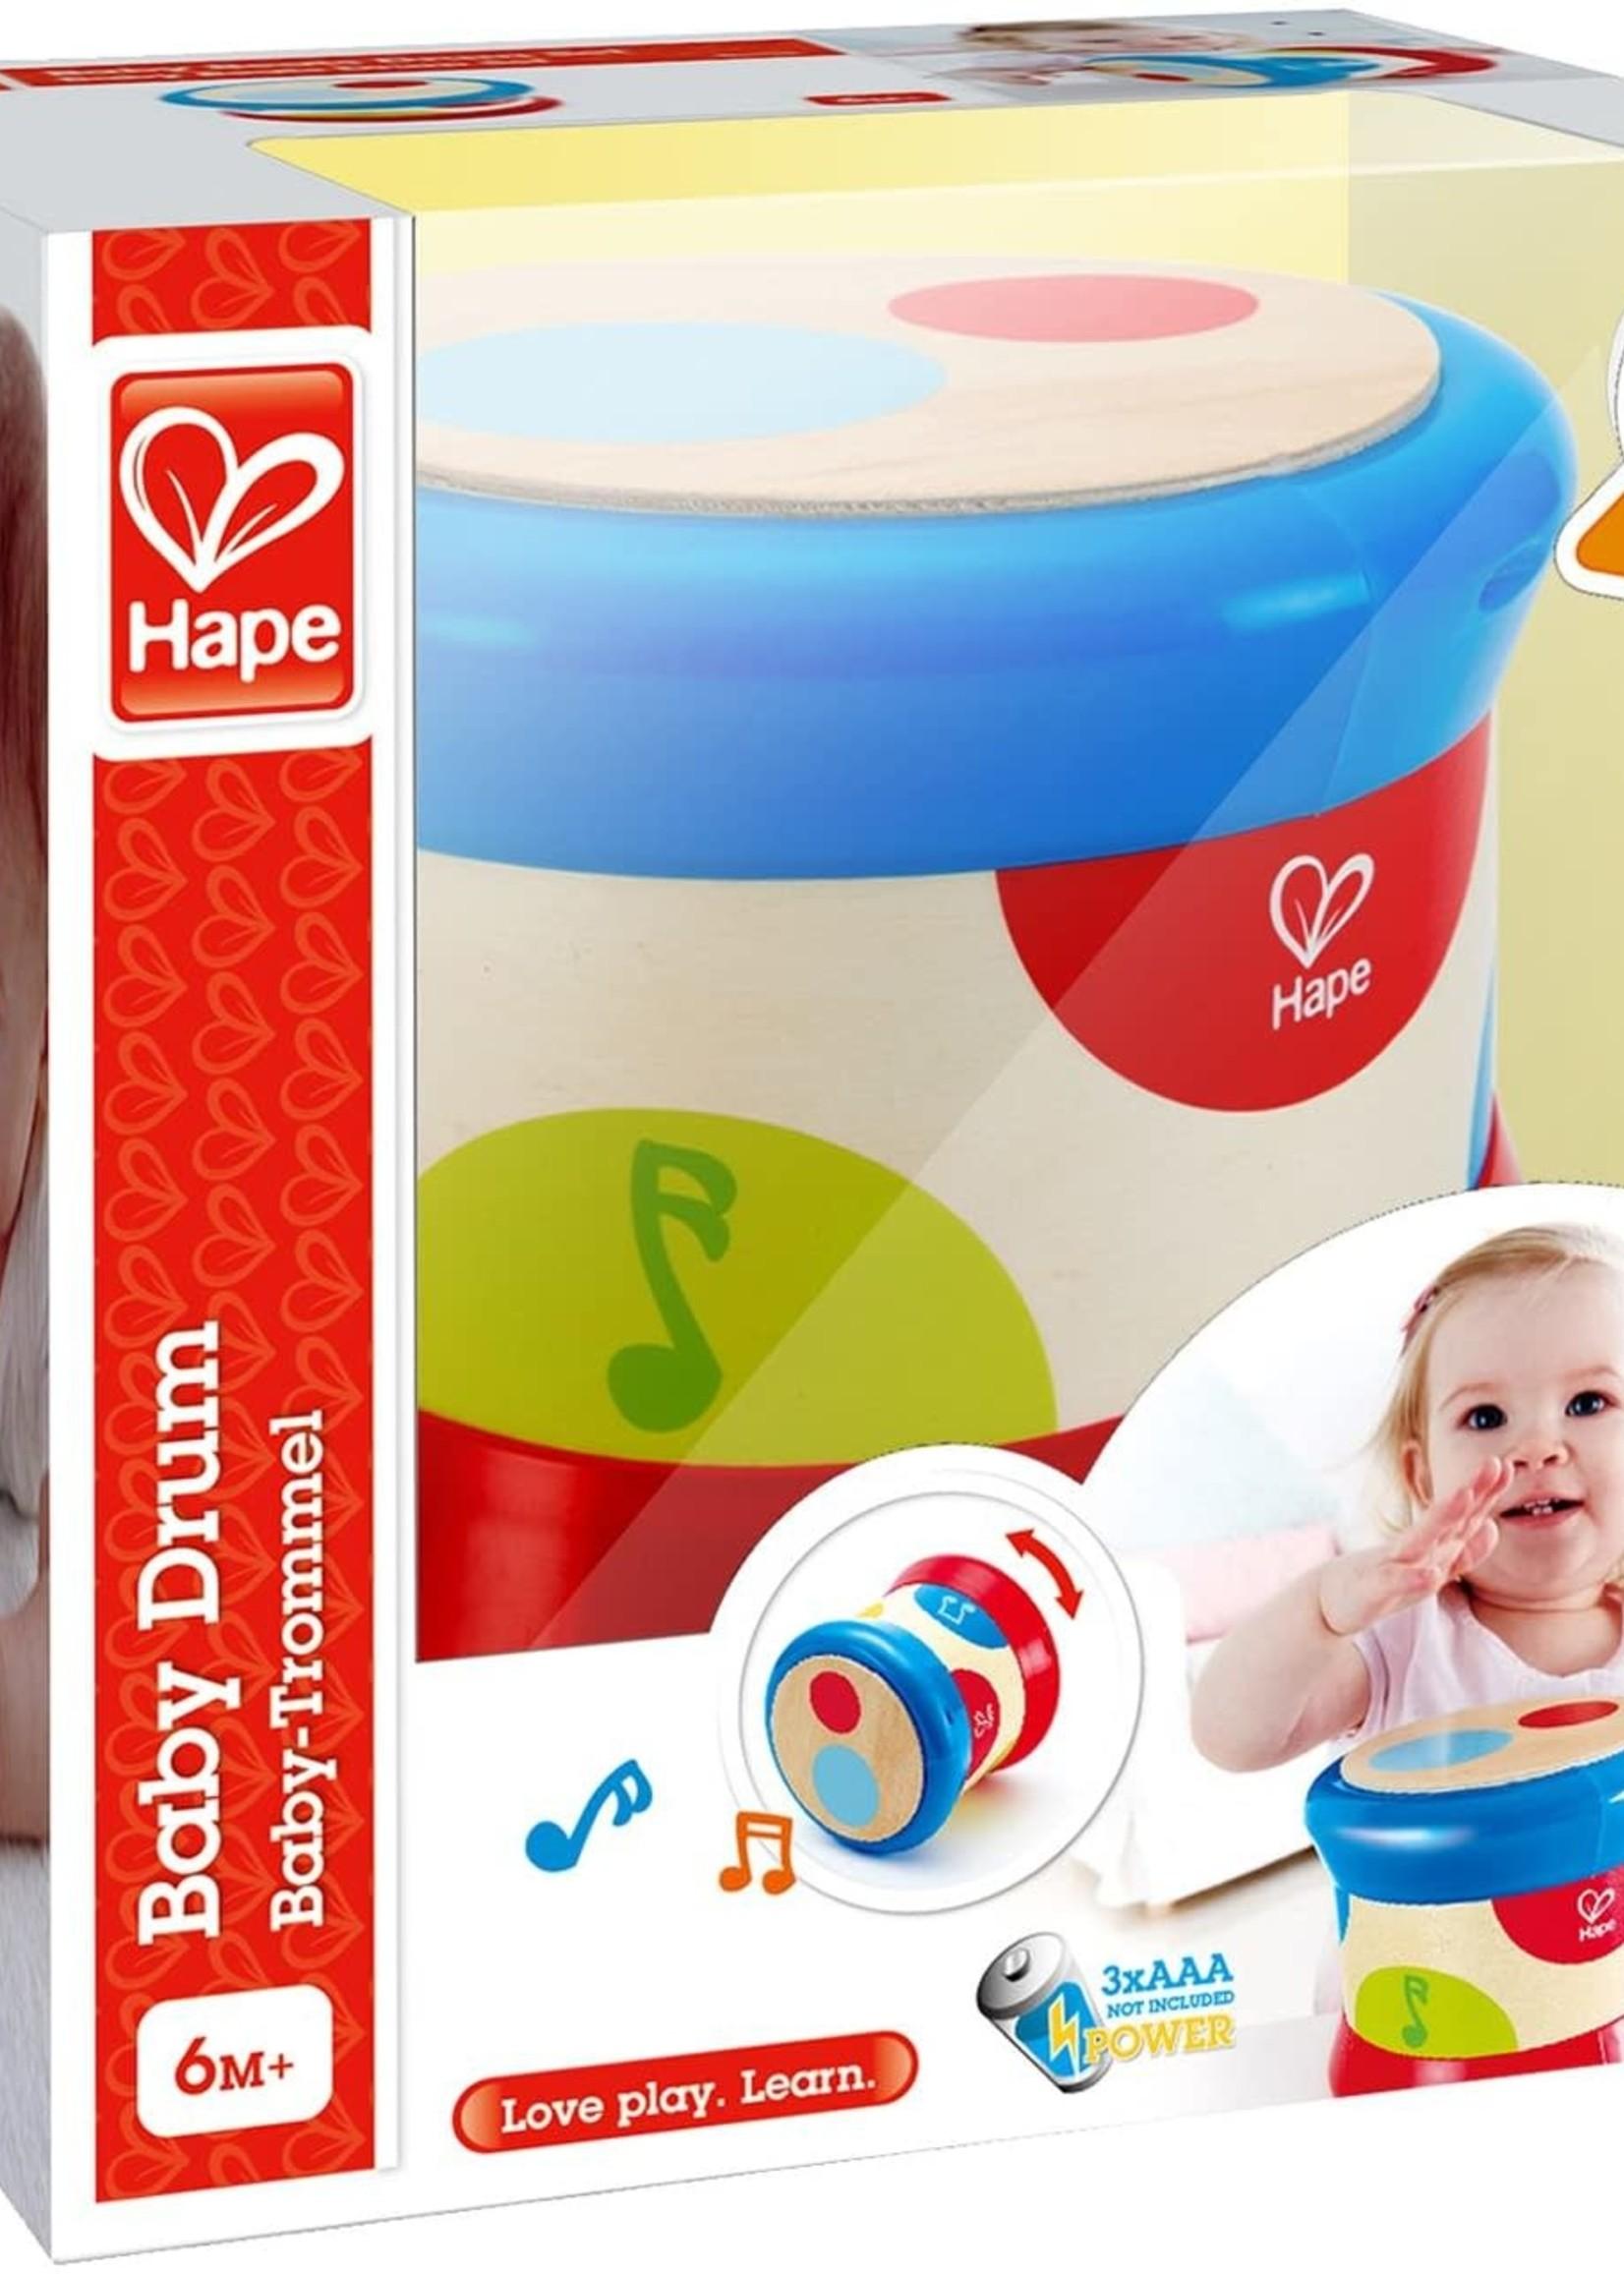 Hape Hape Baby Drum